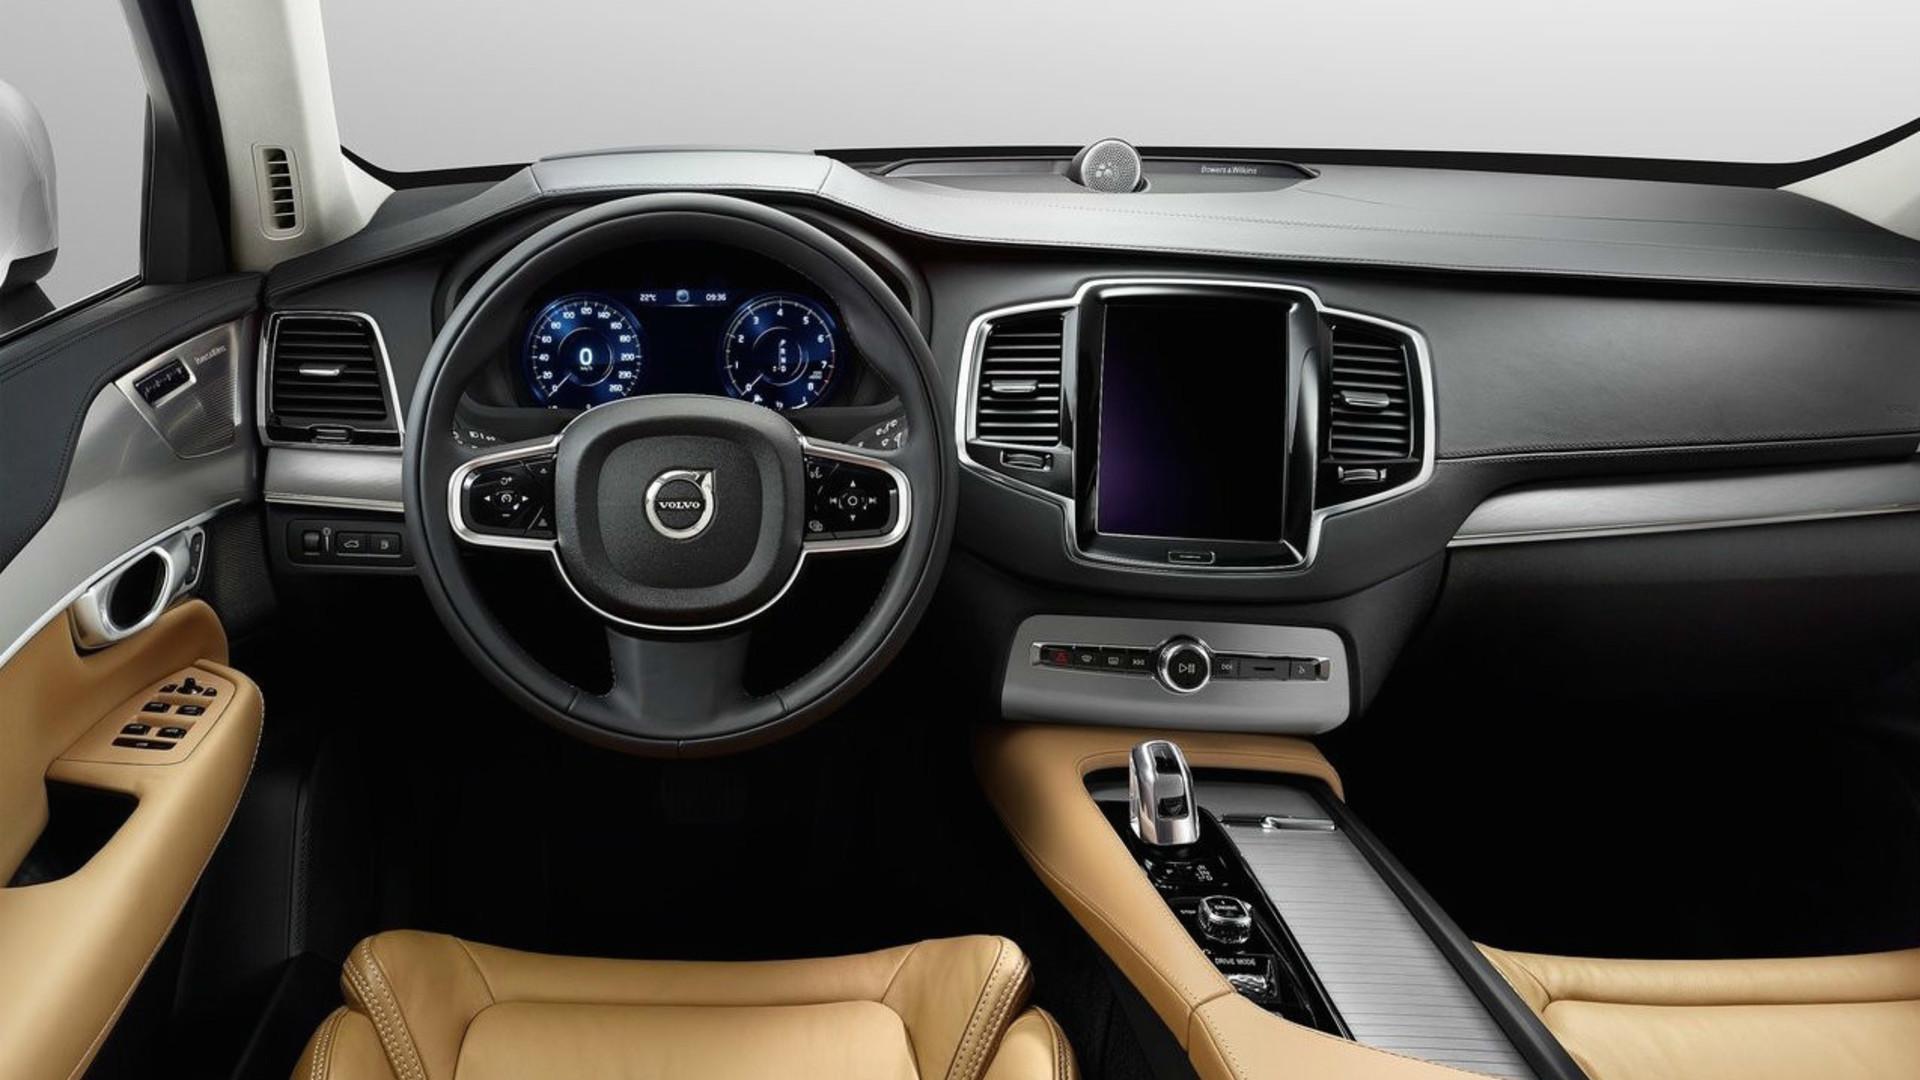 Volvo Xc90 Nin Fiyati Dudak Ucuklatiyor Oto Net